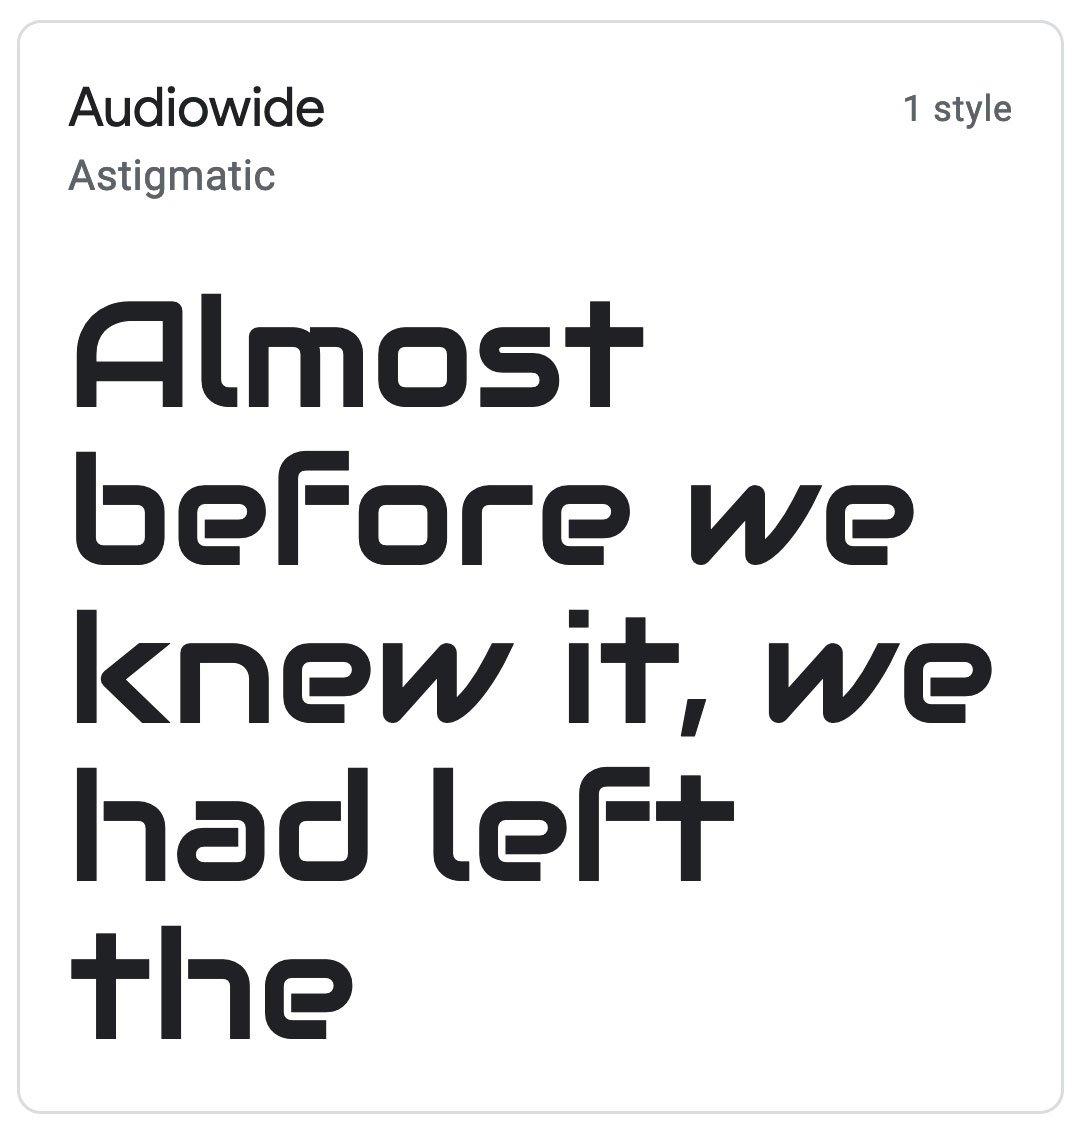 Enfold Fonts Audiowide